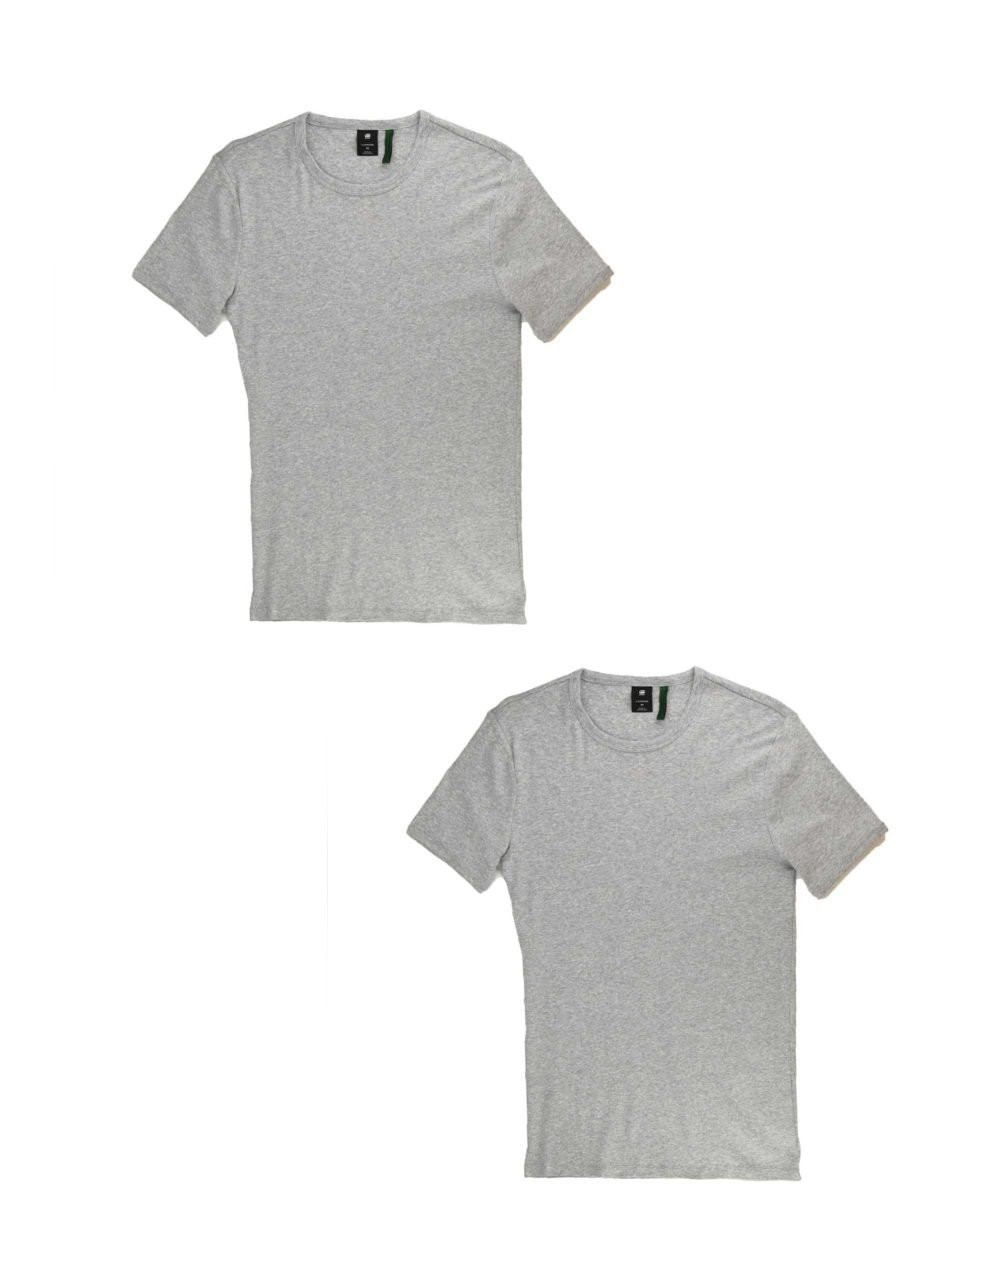 G-Star Raw Basic T-Shirt 2-Pack (D07205-124-906) Grey Heather